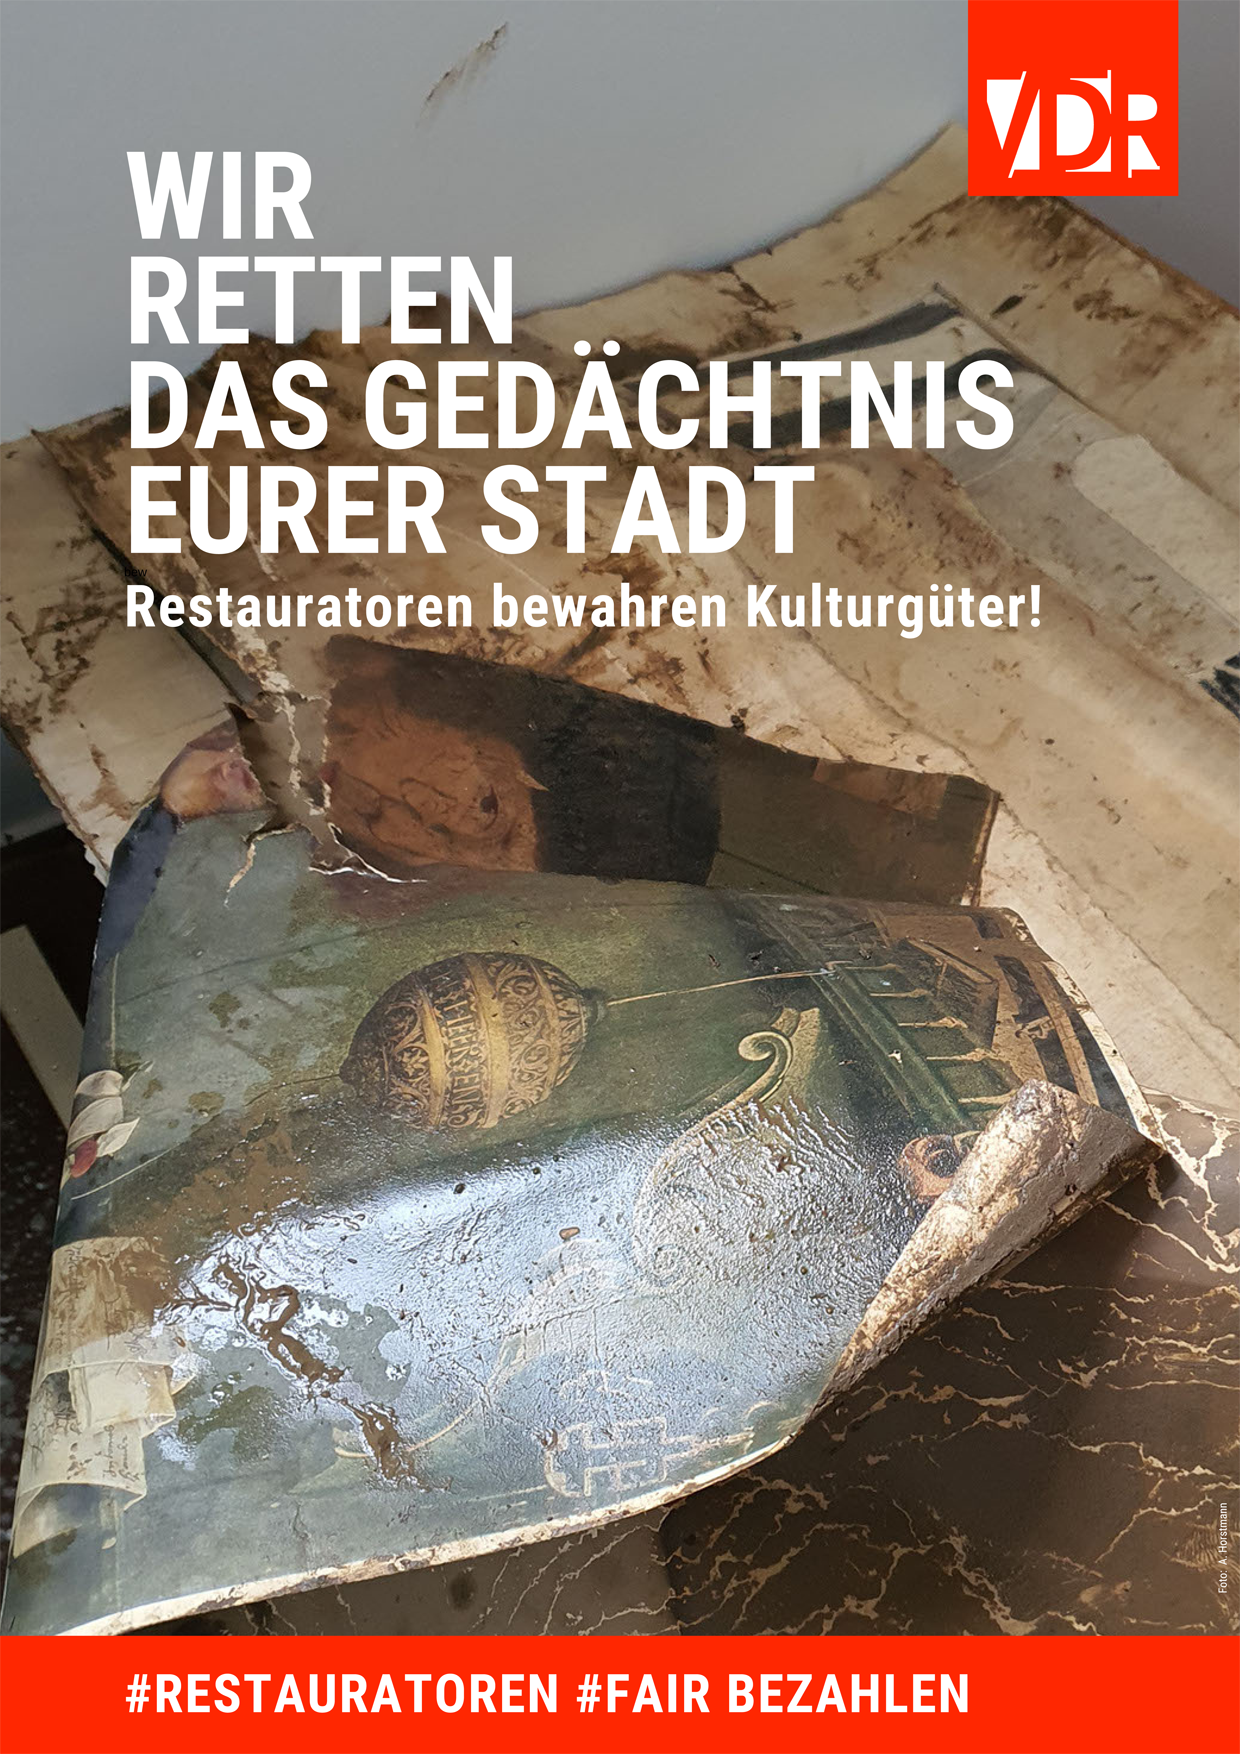 2021-08-31_Poster_04_VDR-Tarifkampagne_m_web